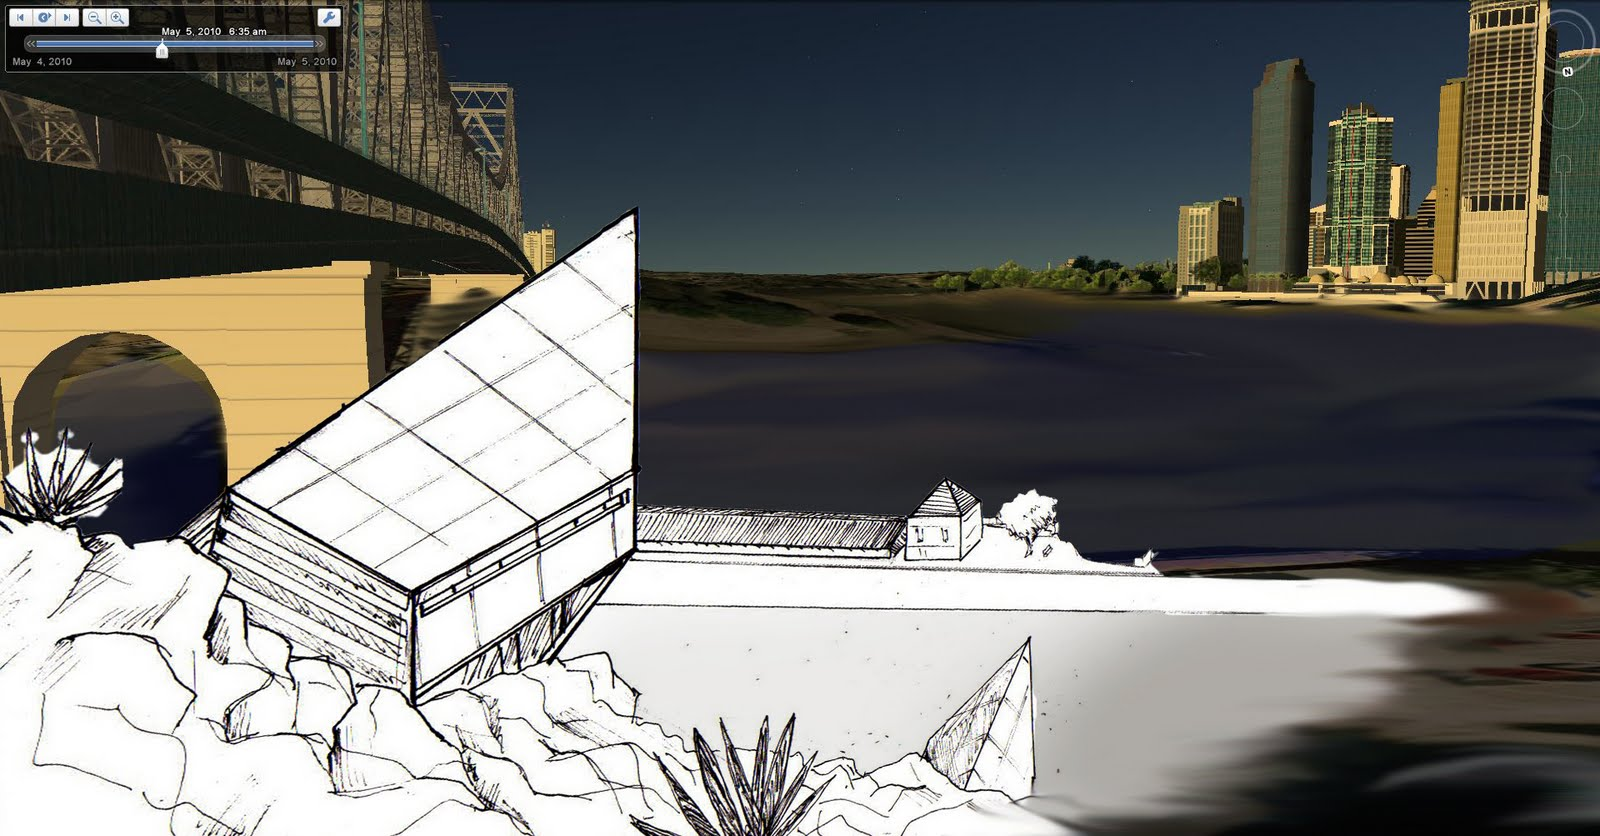 Architectural Design 5 @ QUT